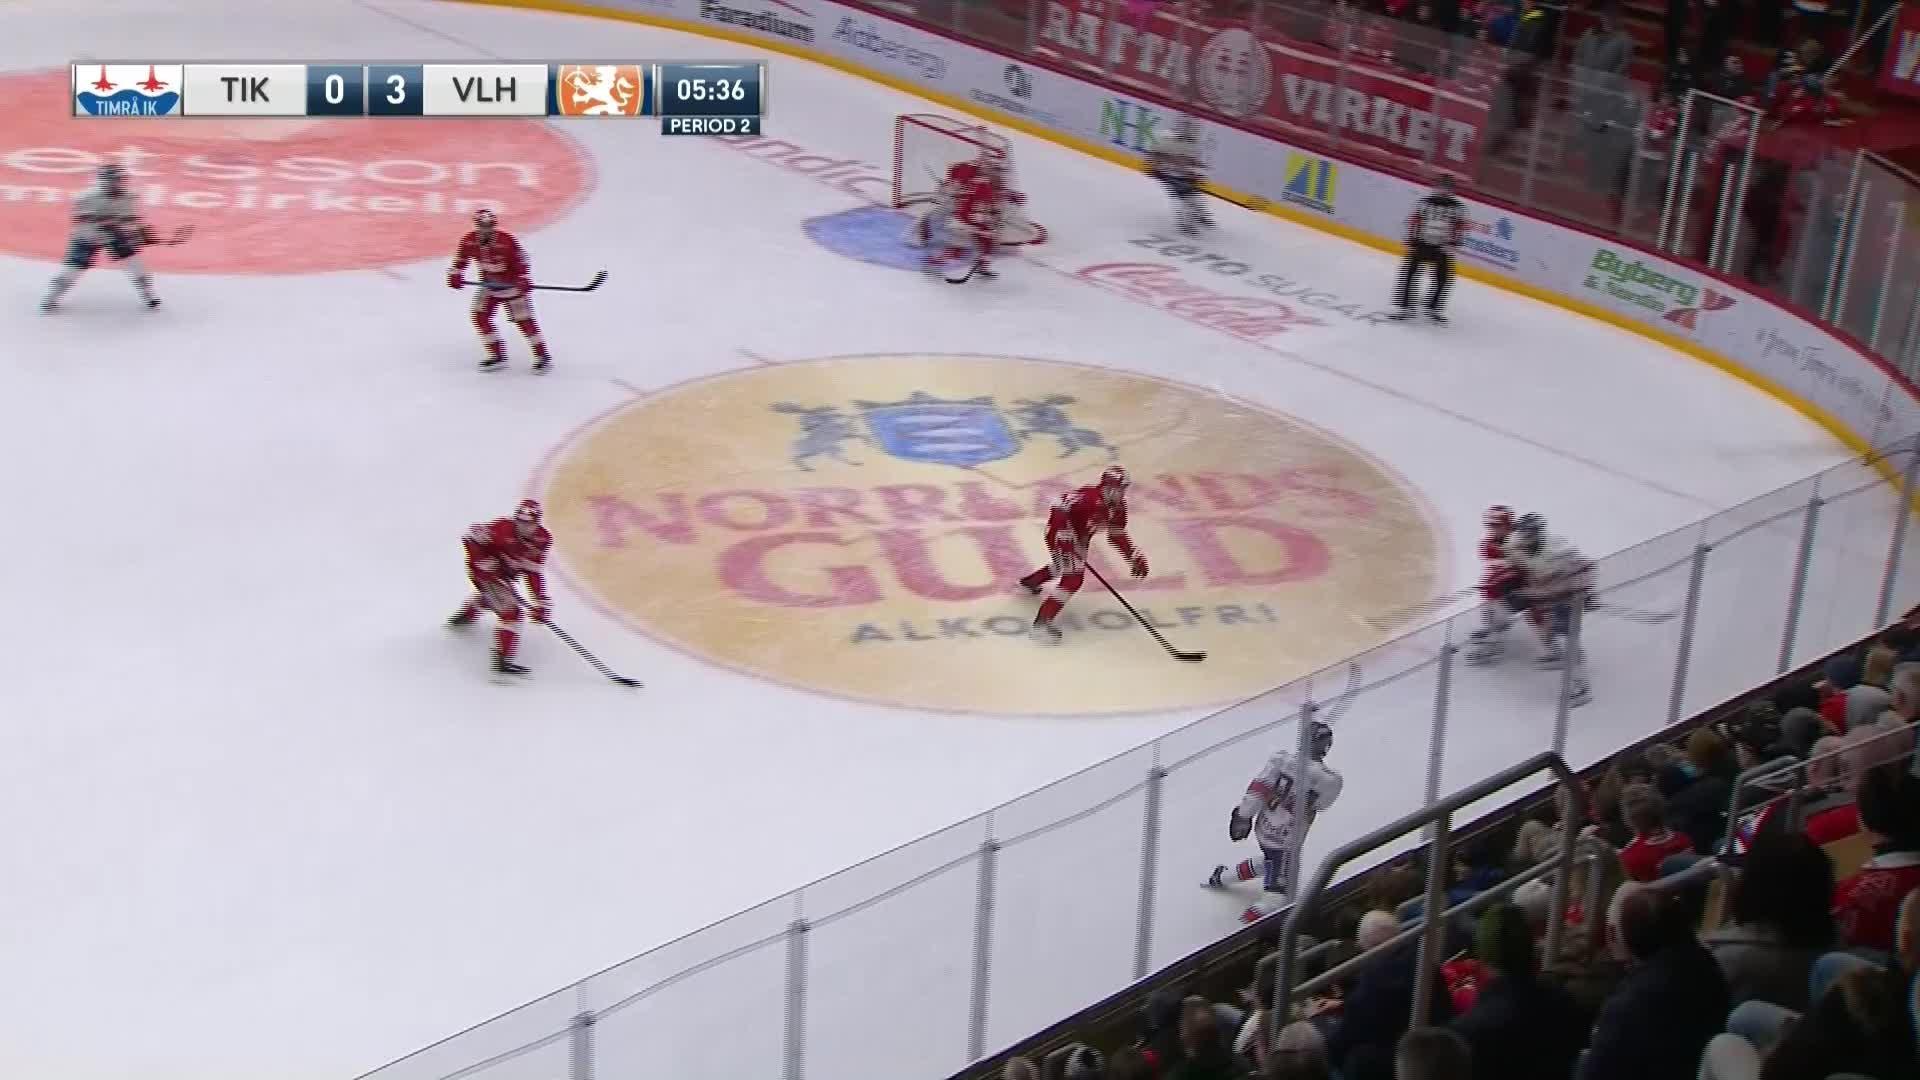 Timrå IK - Växjö Lakers 0-4